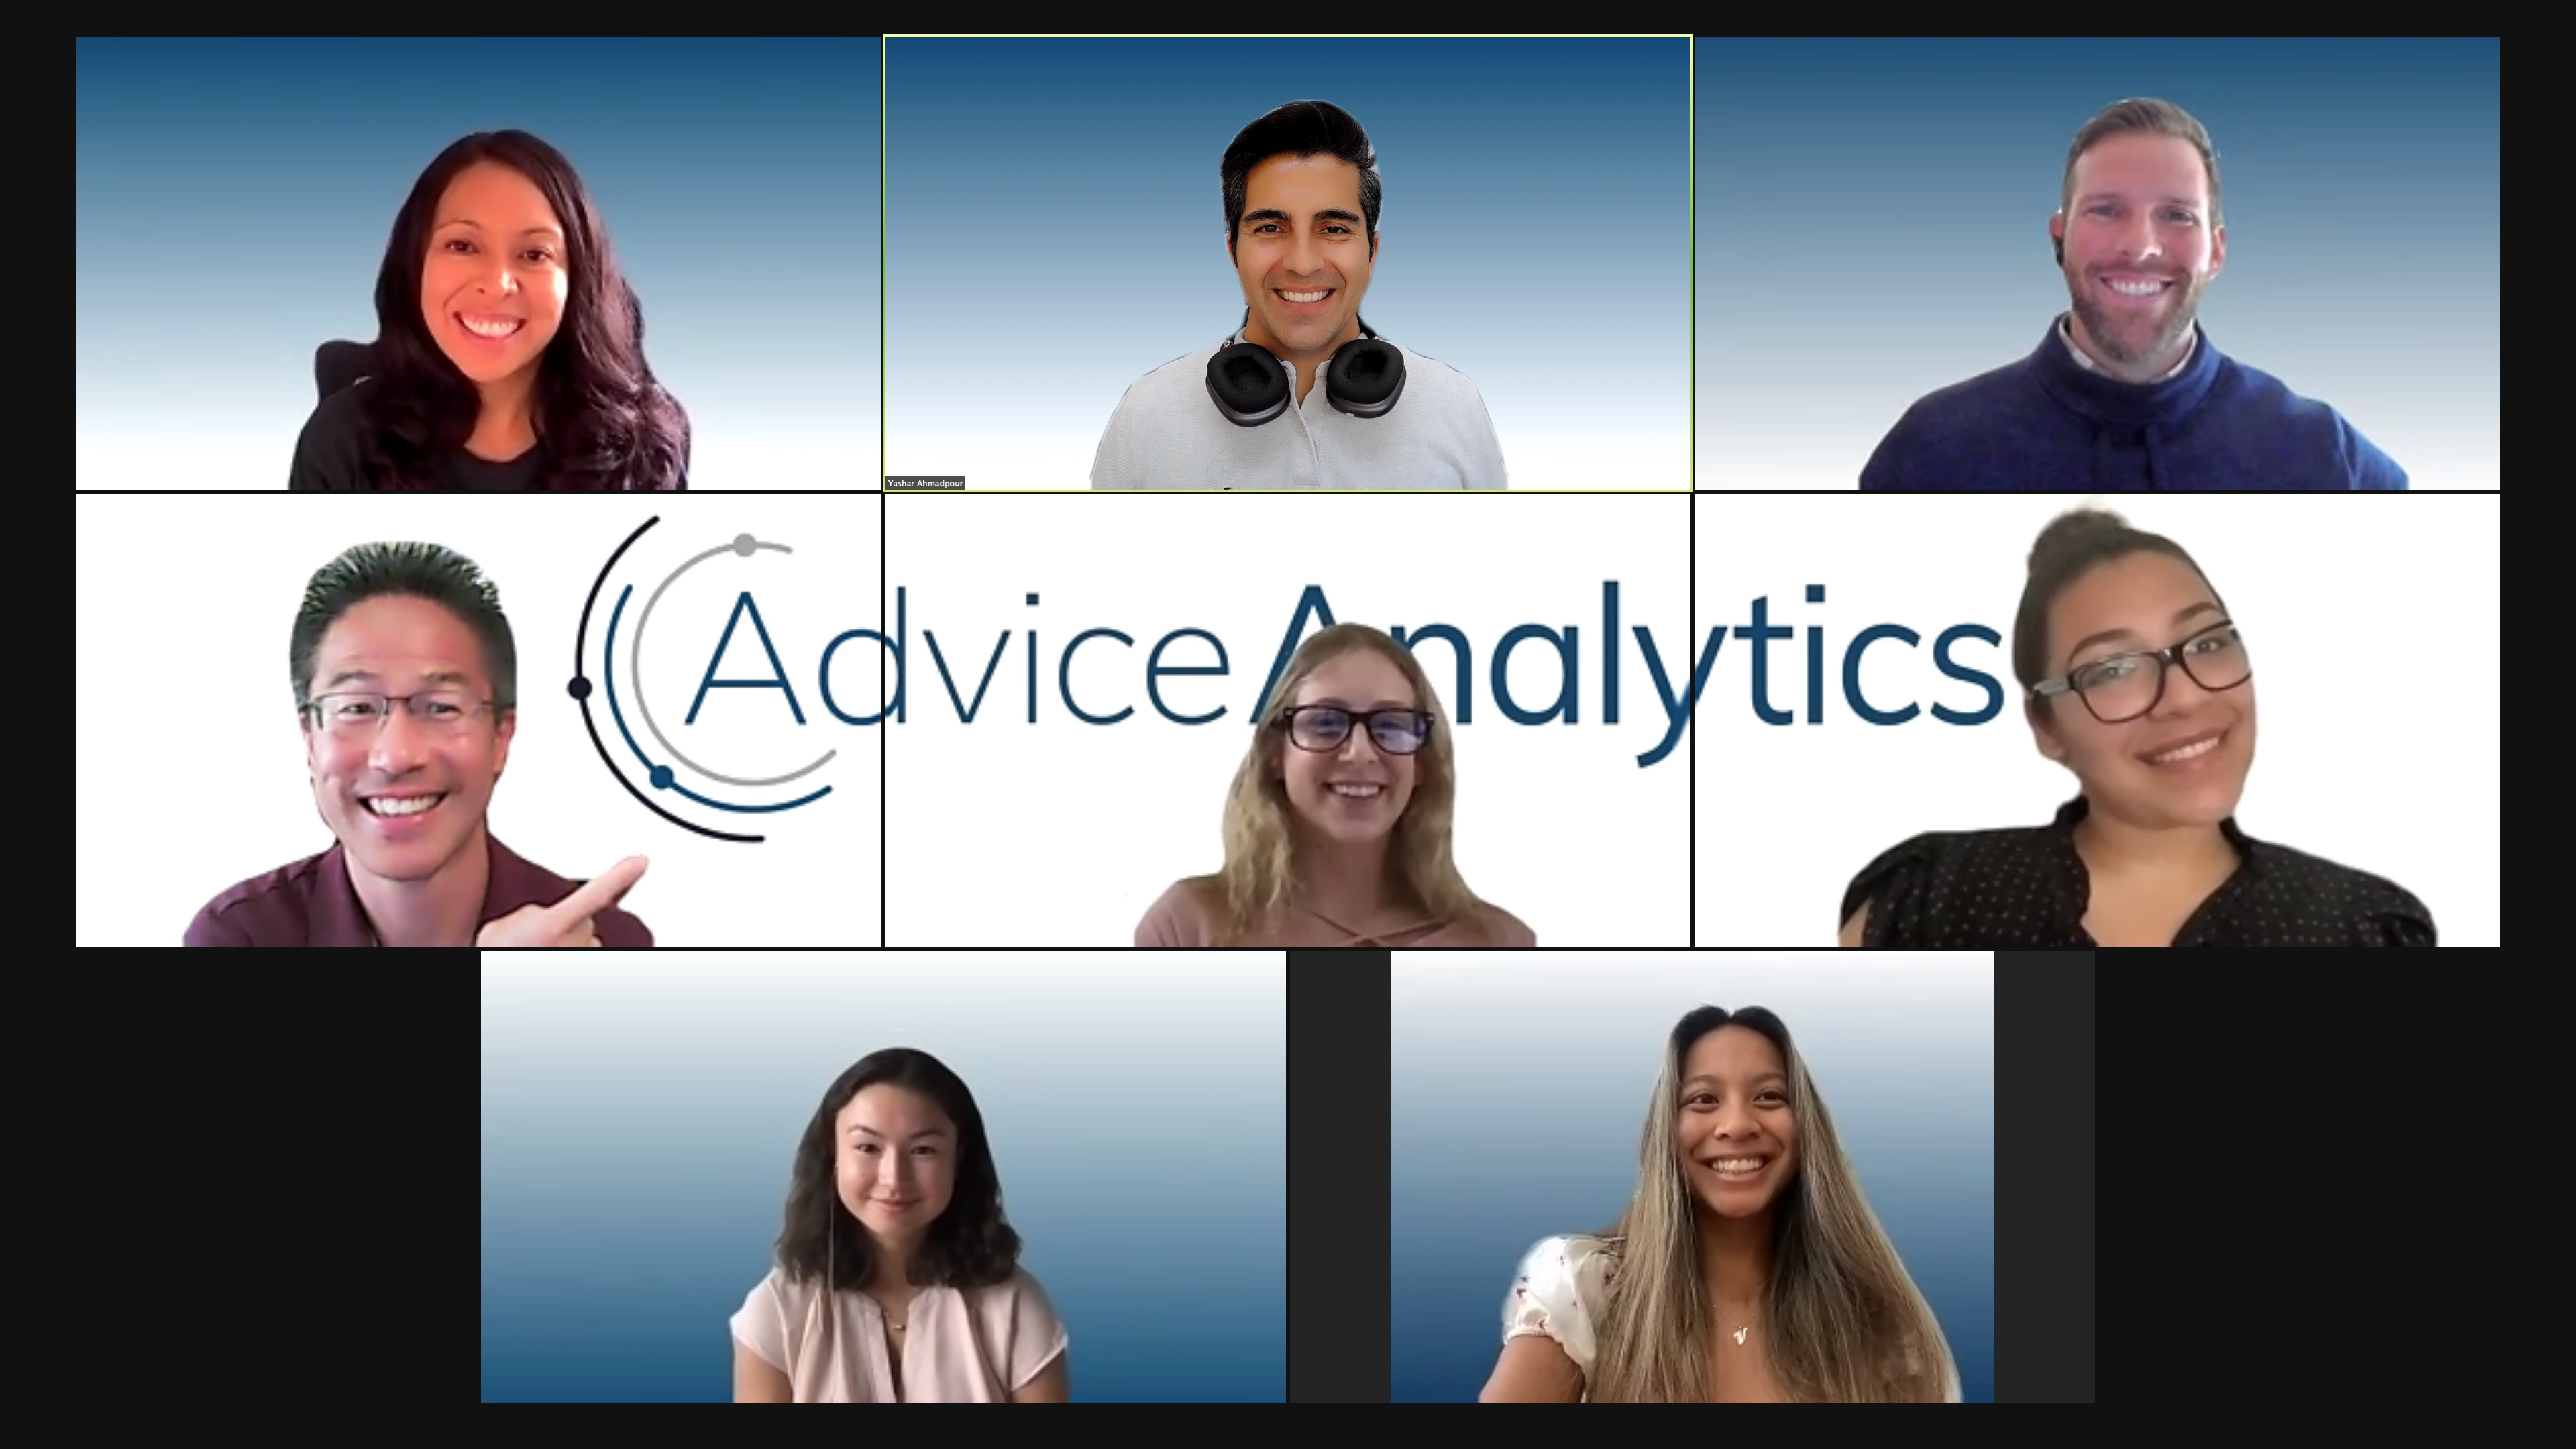 Photo of Advice Analytics team